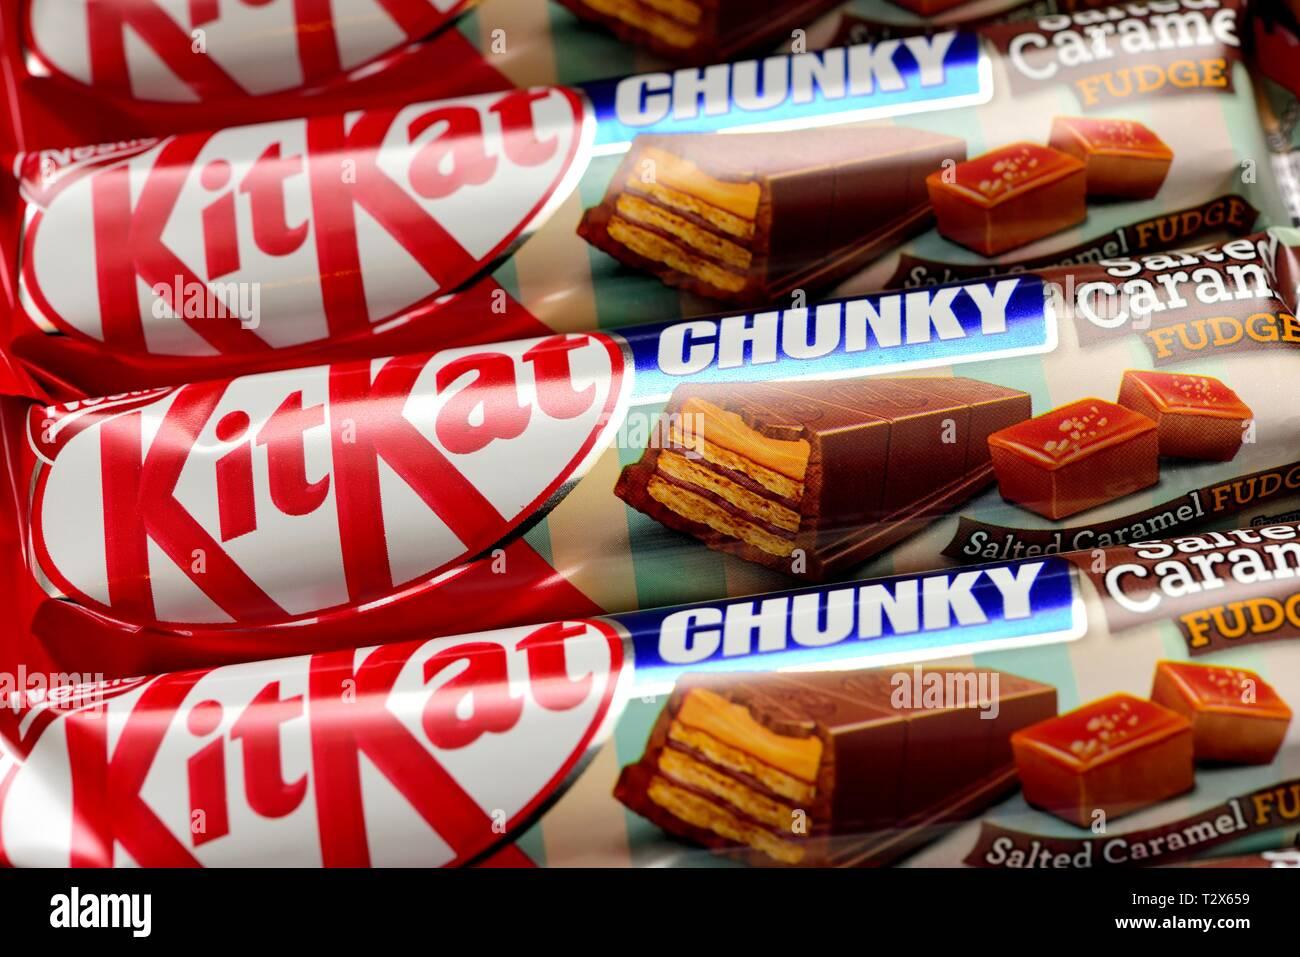 Kitkat Chunky,Salted Caramel fudge - Stock Image